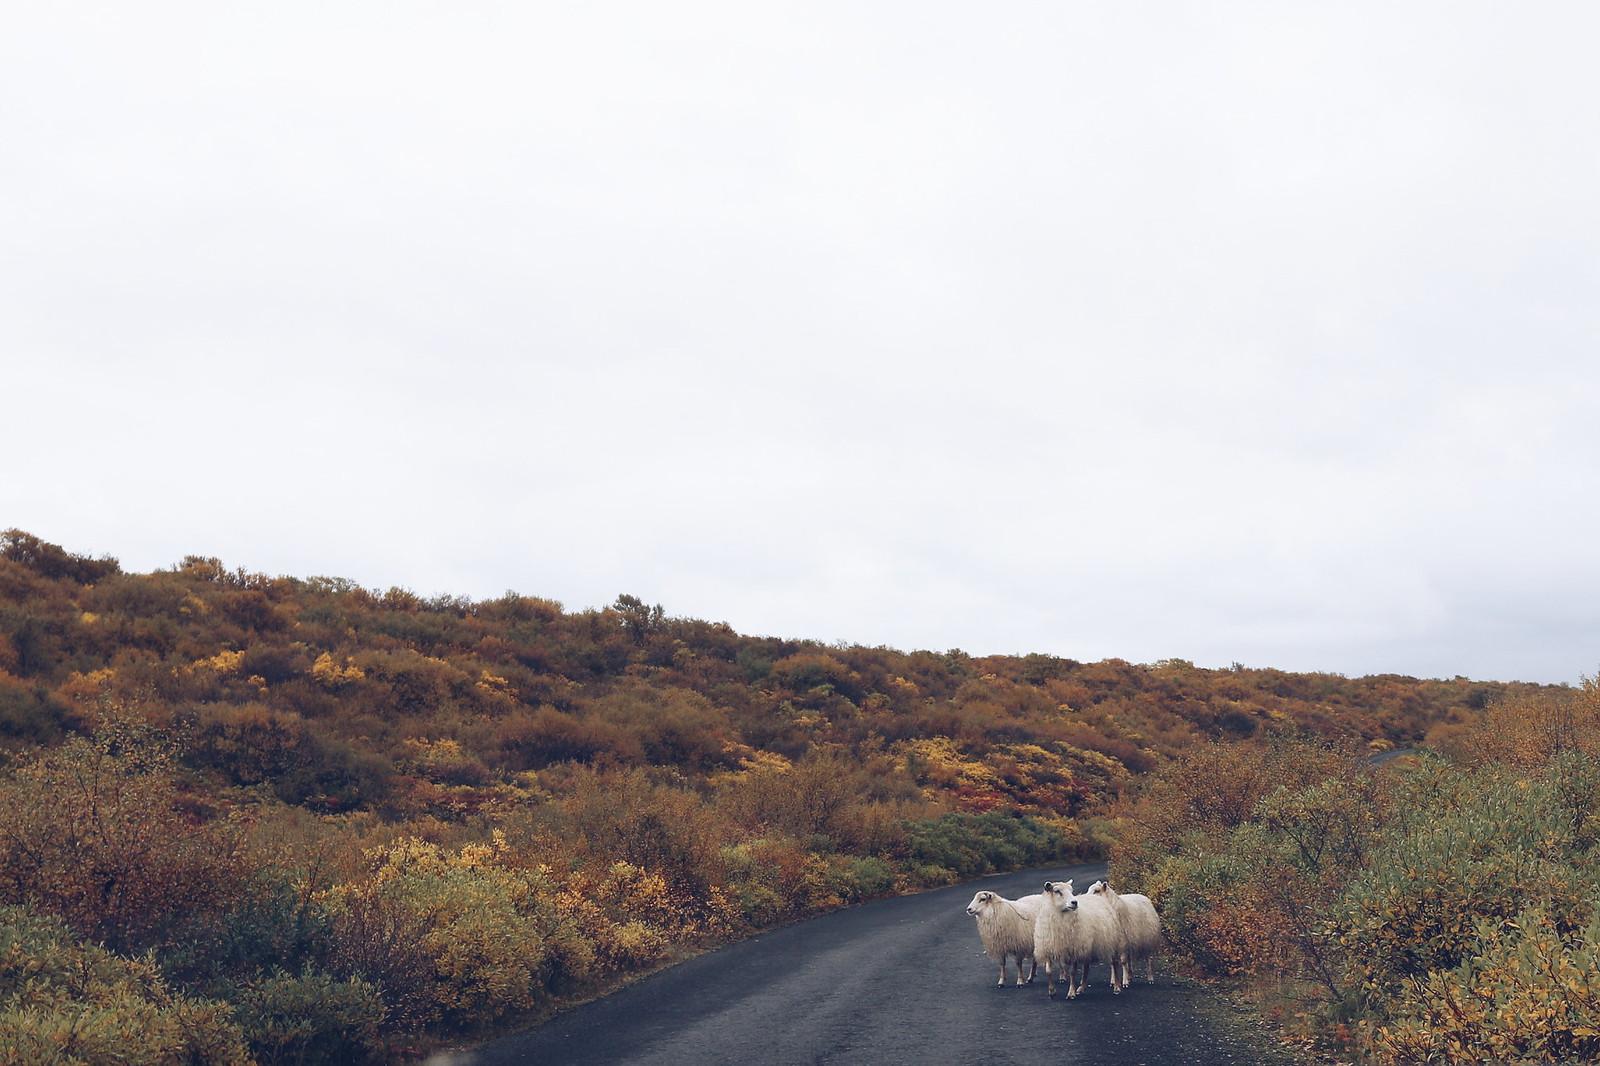 #iceland #sheep #road